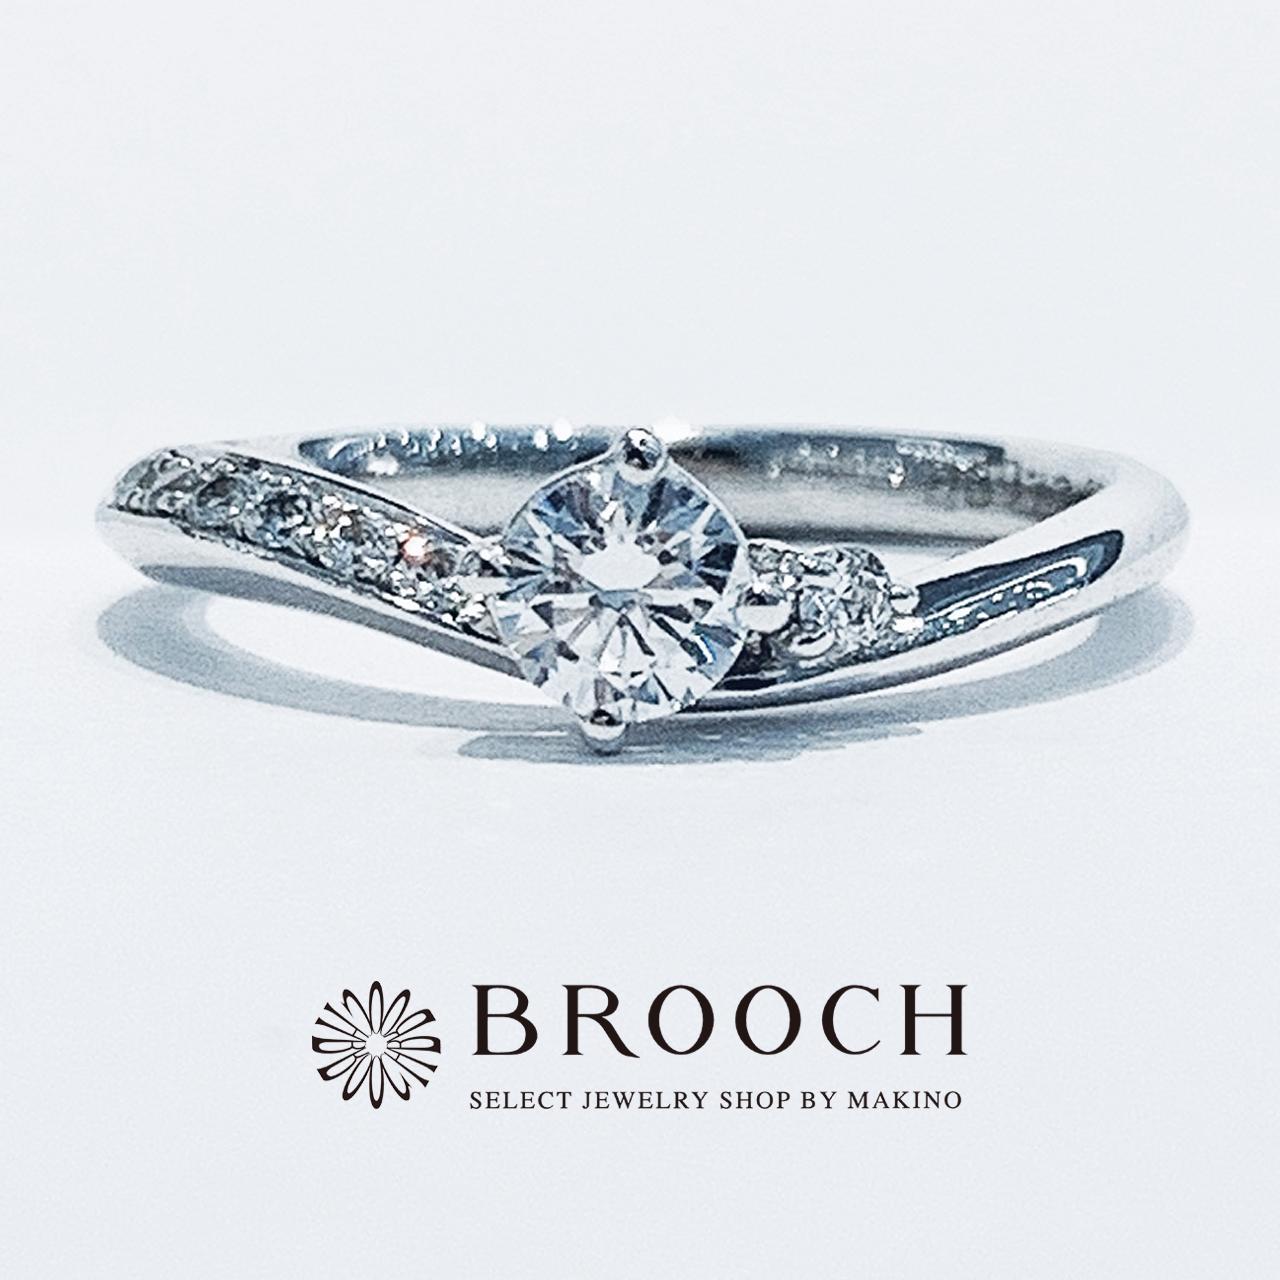 BROOCH 婚約指輪 エンゲージリング シンプル ウェーブデザイン